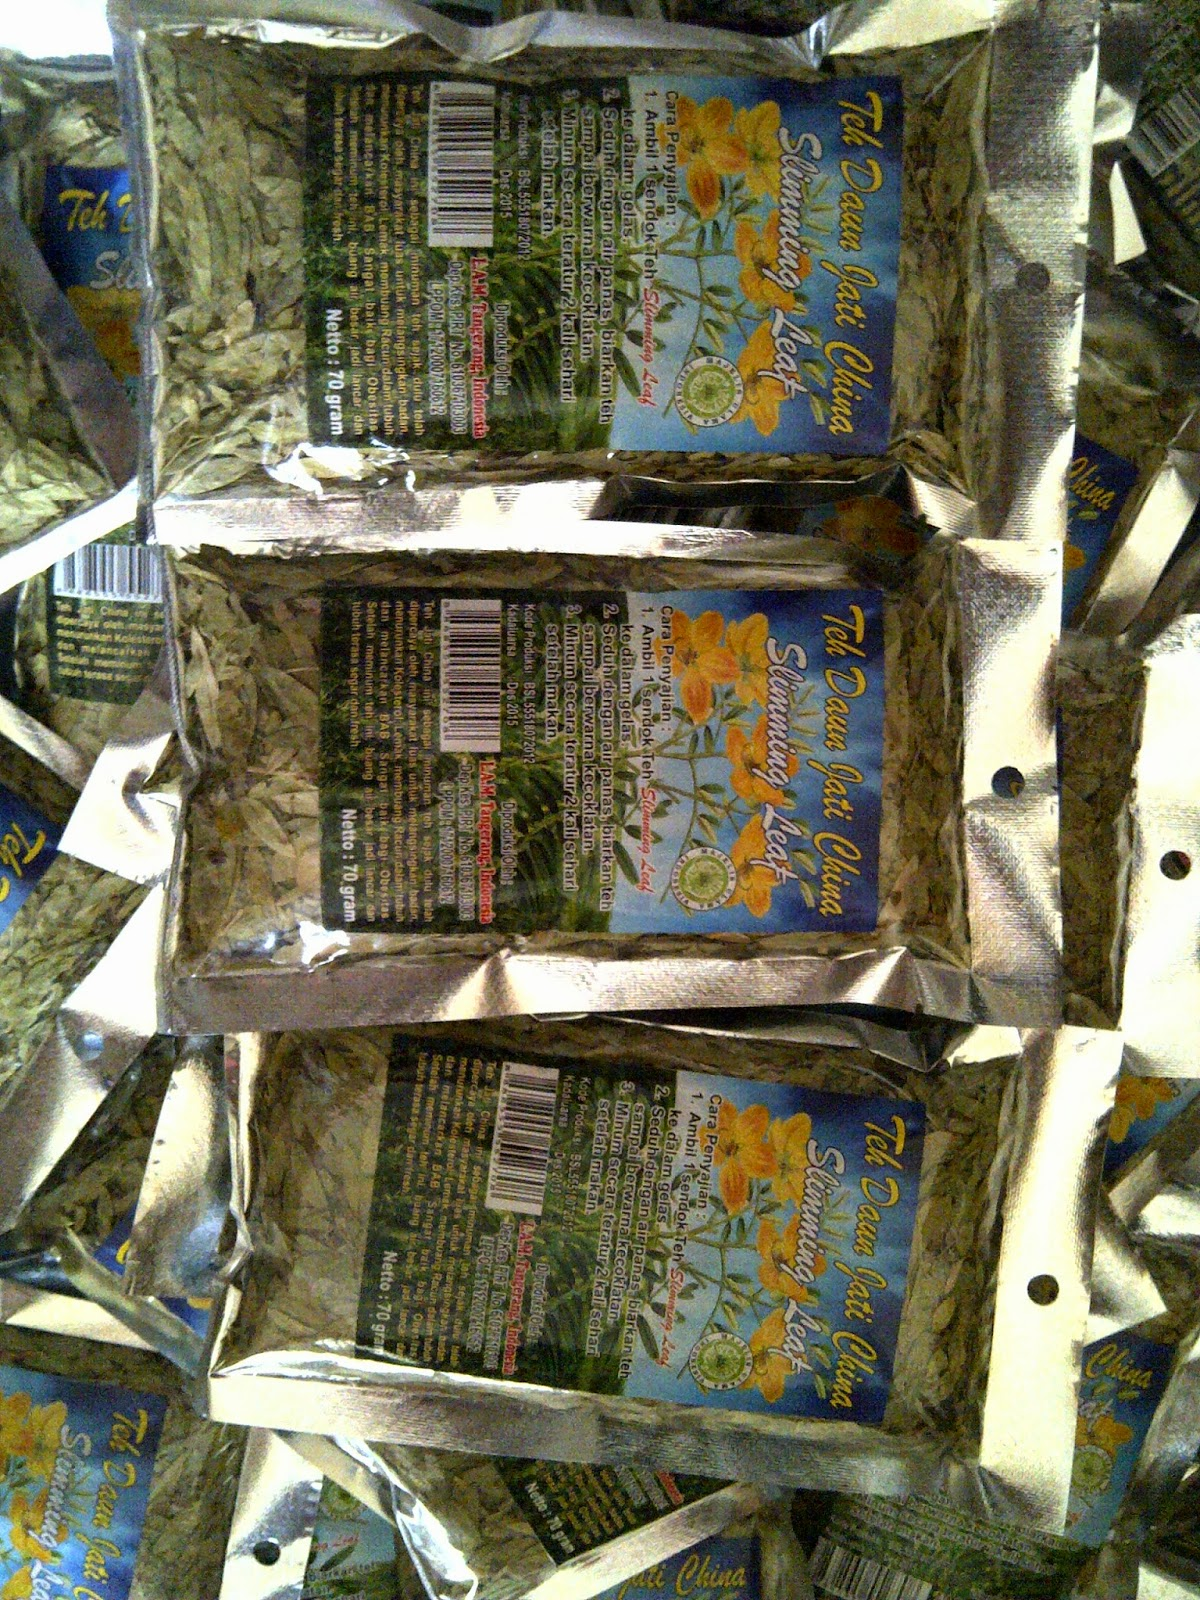 Paket Pelangsing Badan Murah Turun Diatas 1-5 Kg Delivery Jakarta Timur